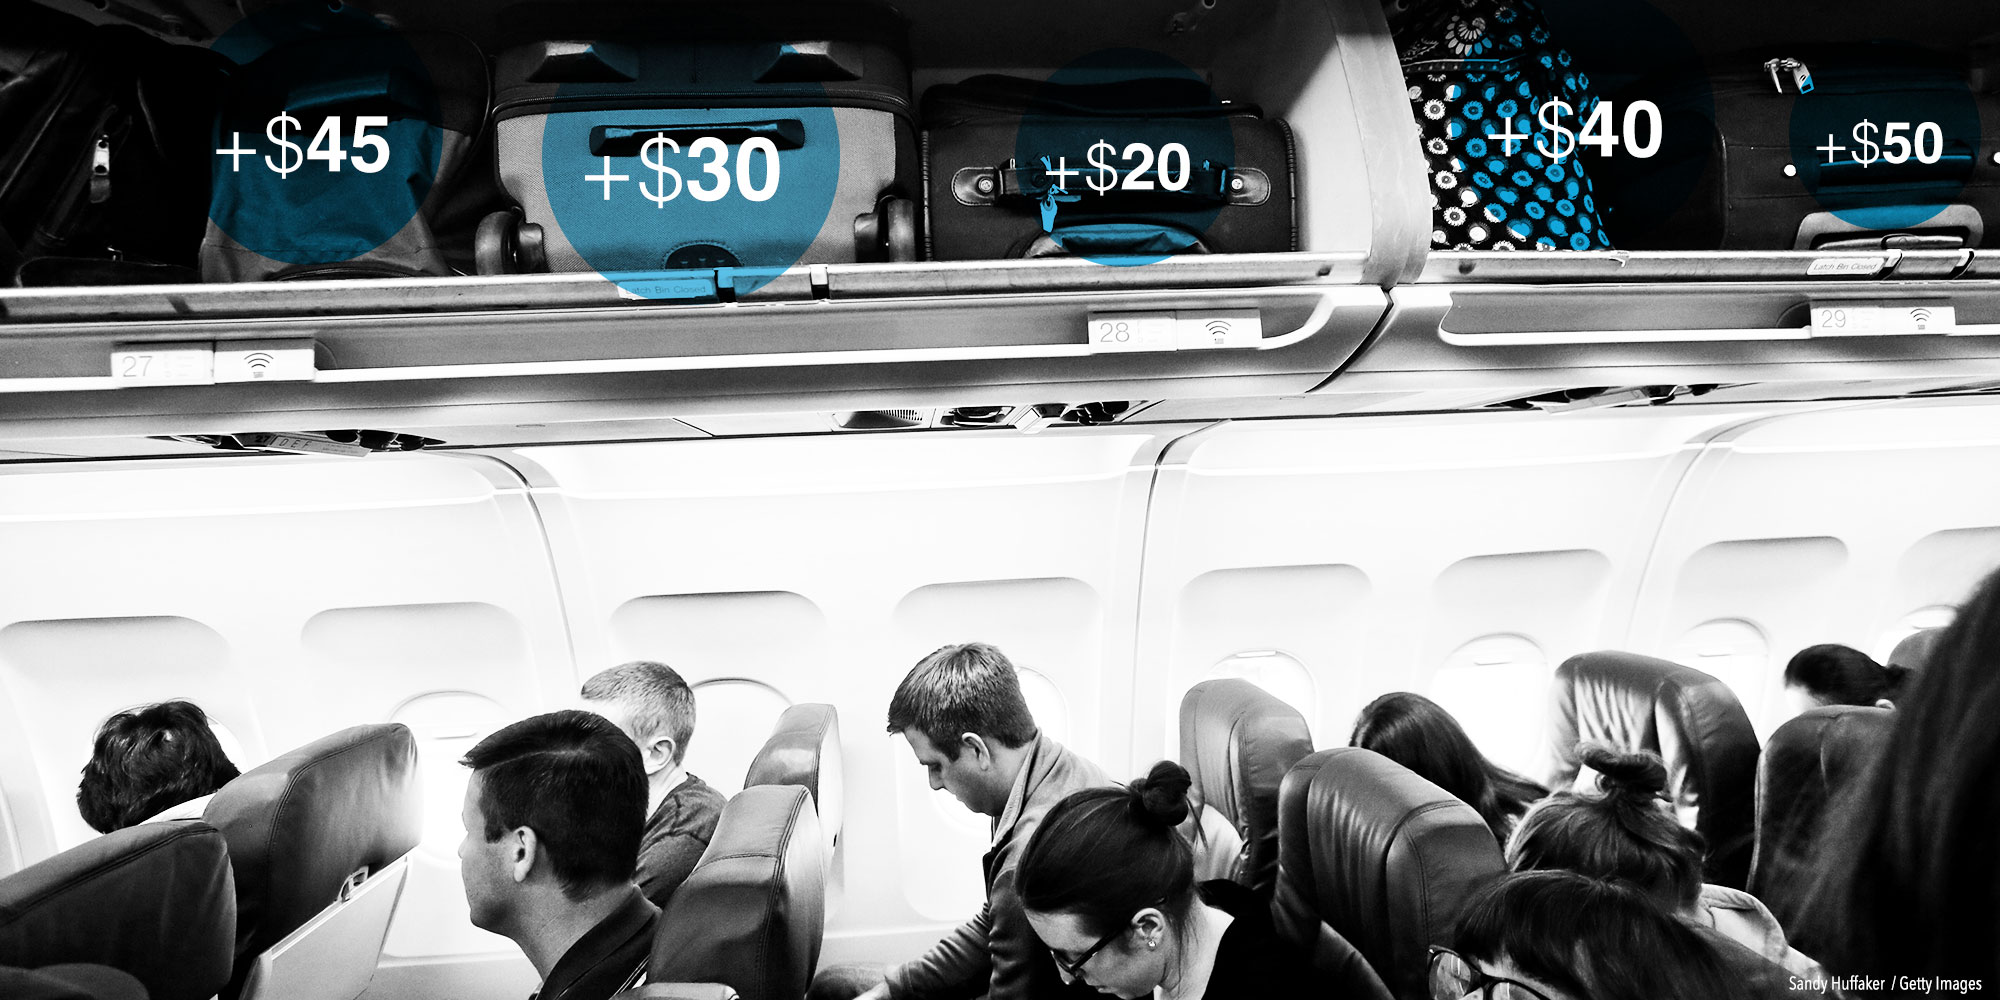 2---AIRLINE-FEES.jpg